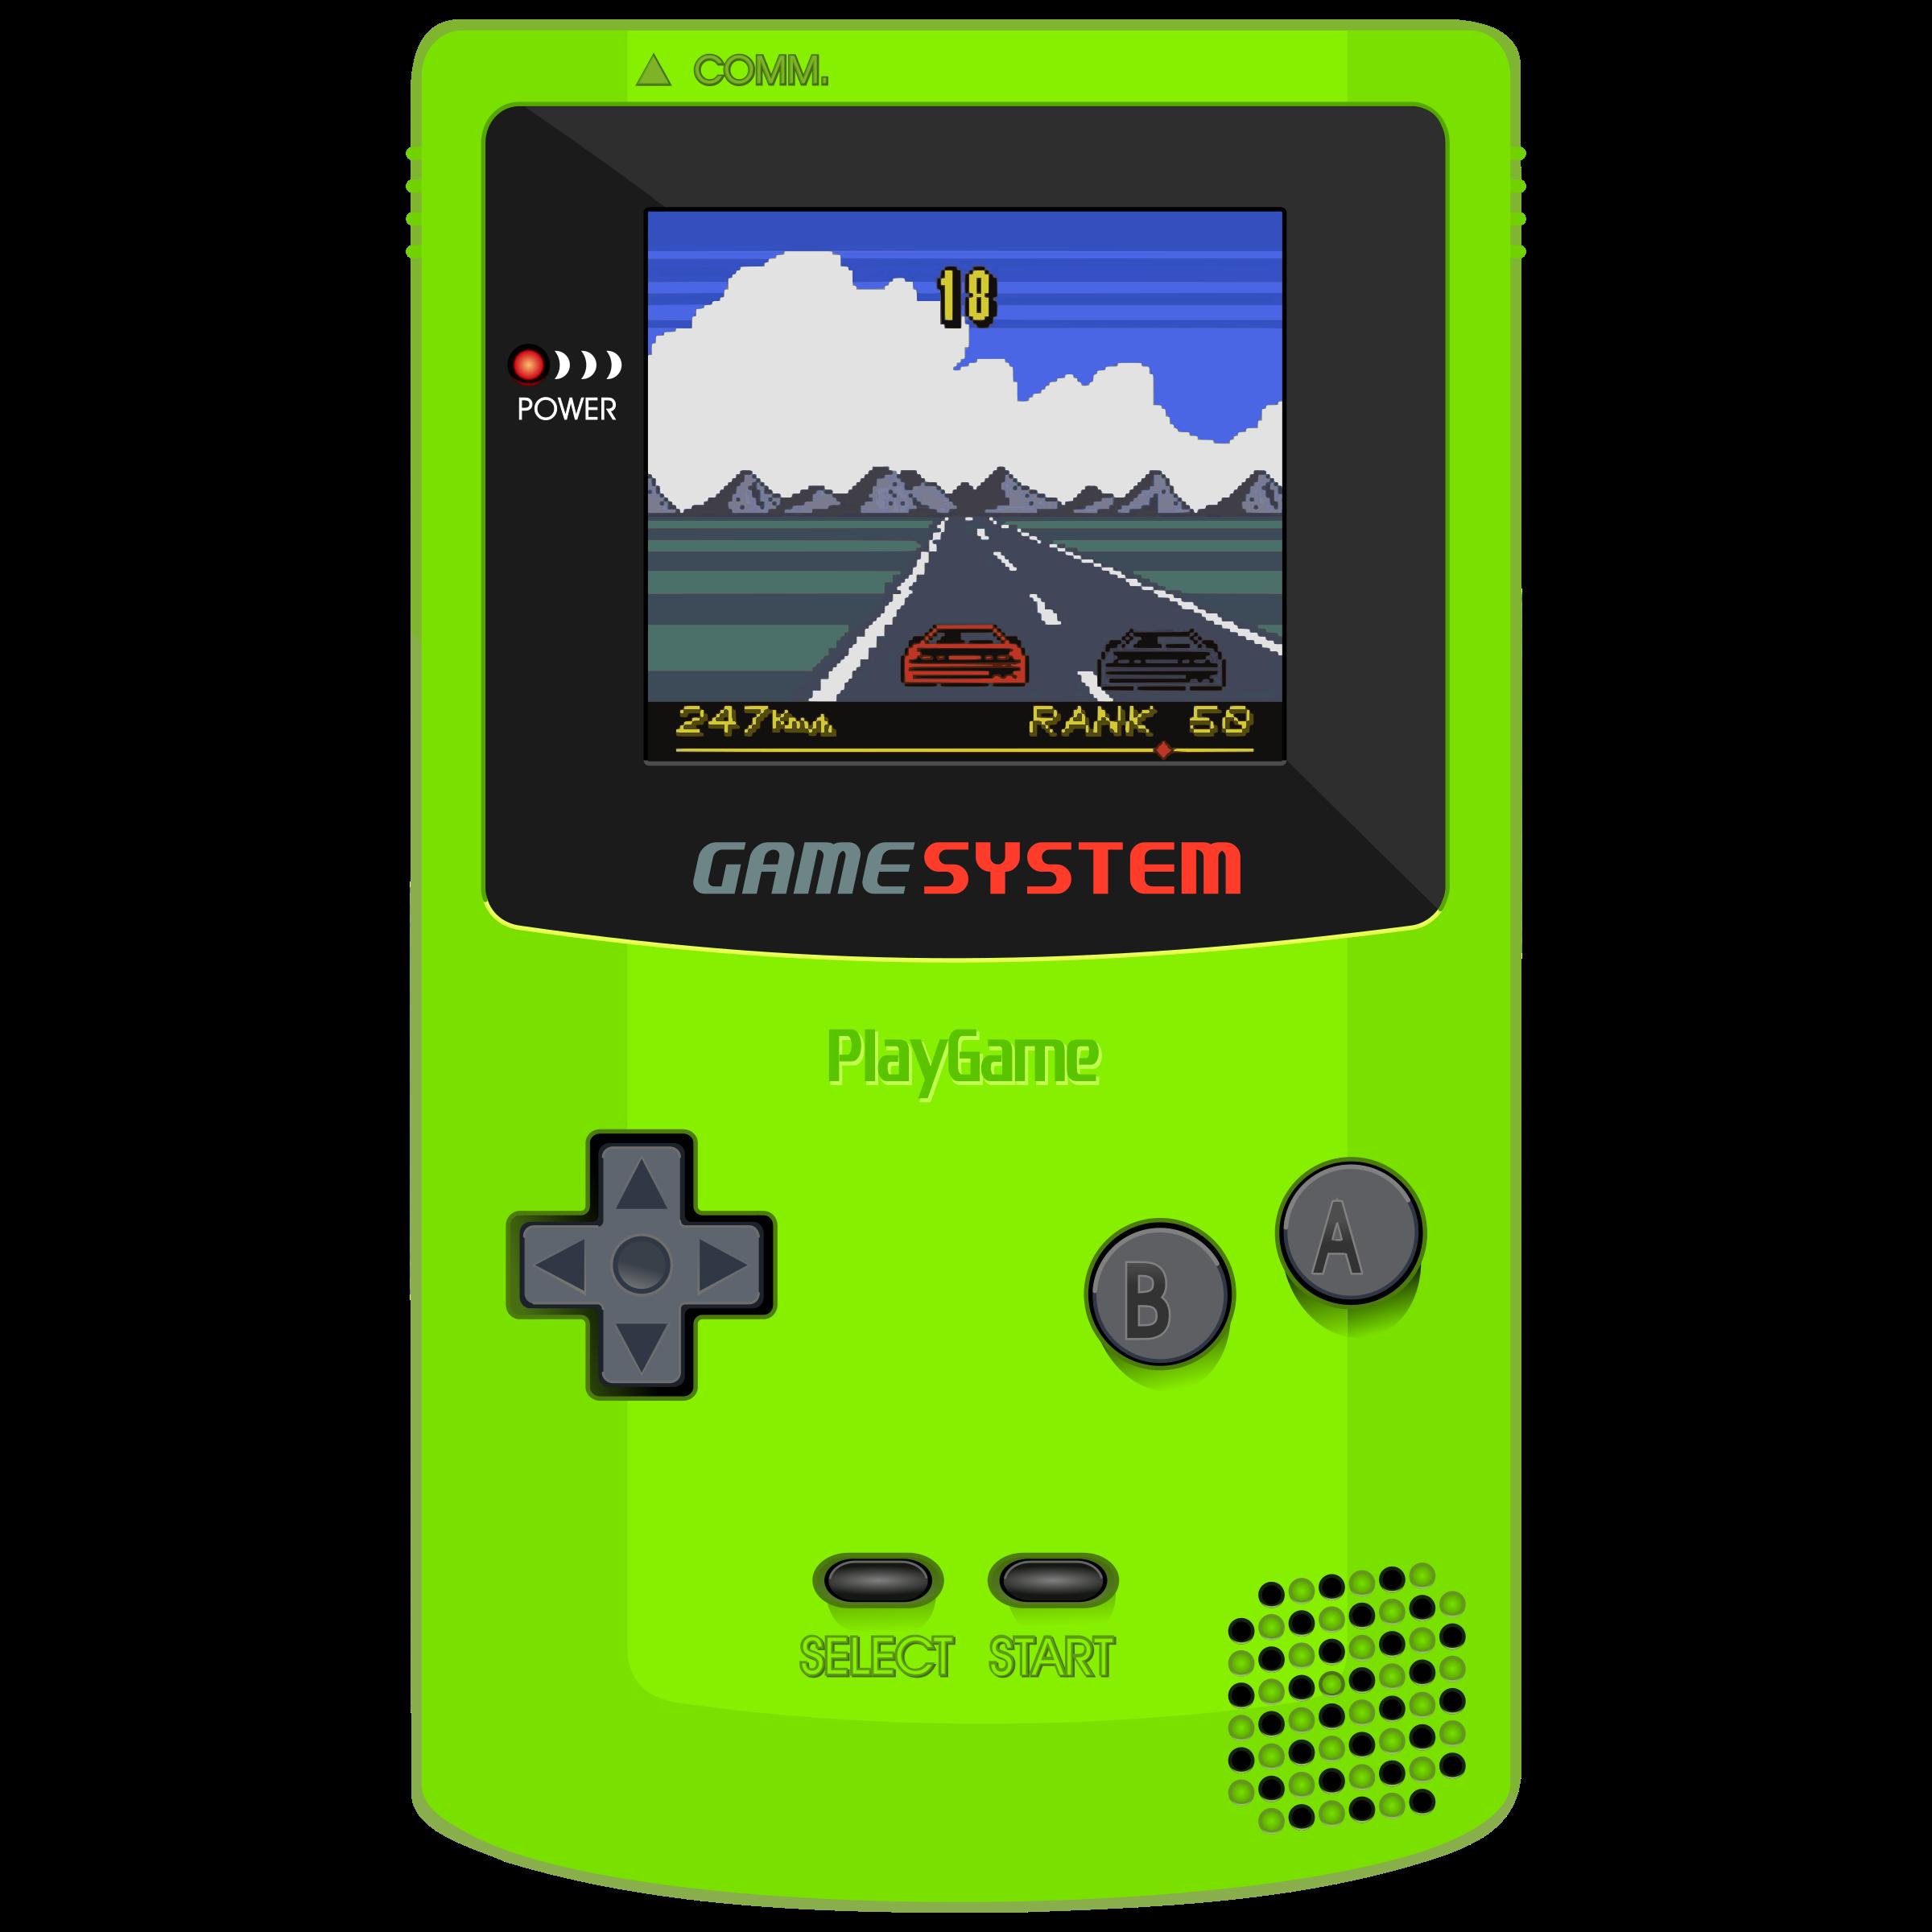 Game clipart gameboy. Video system portative big